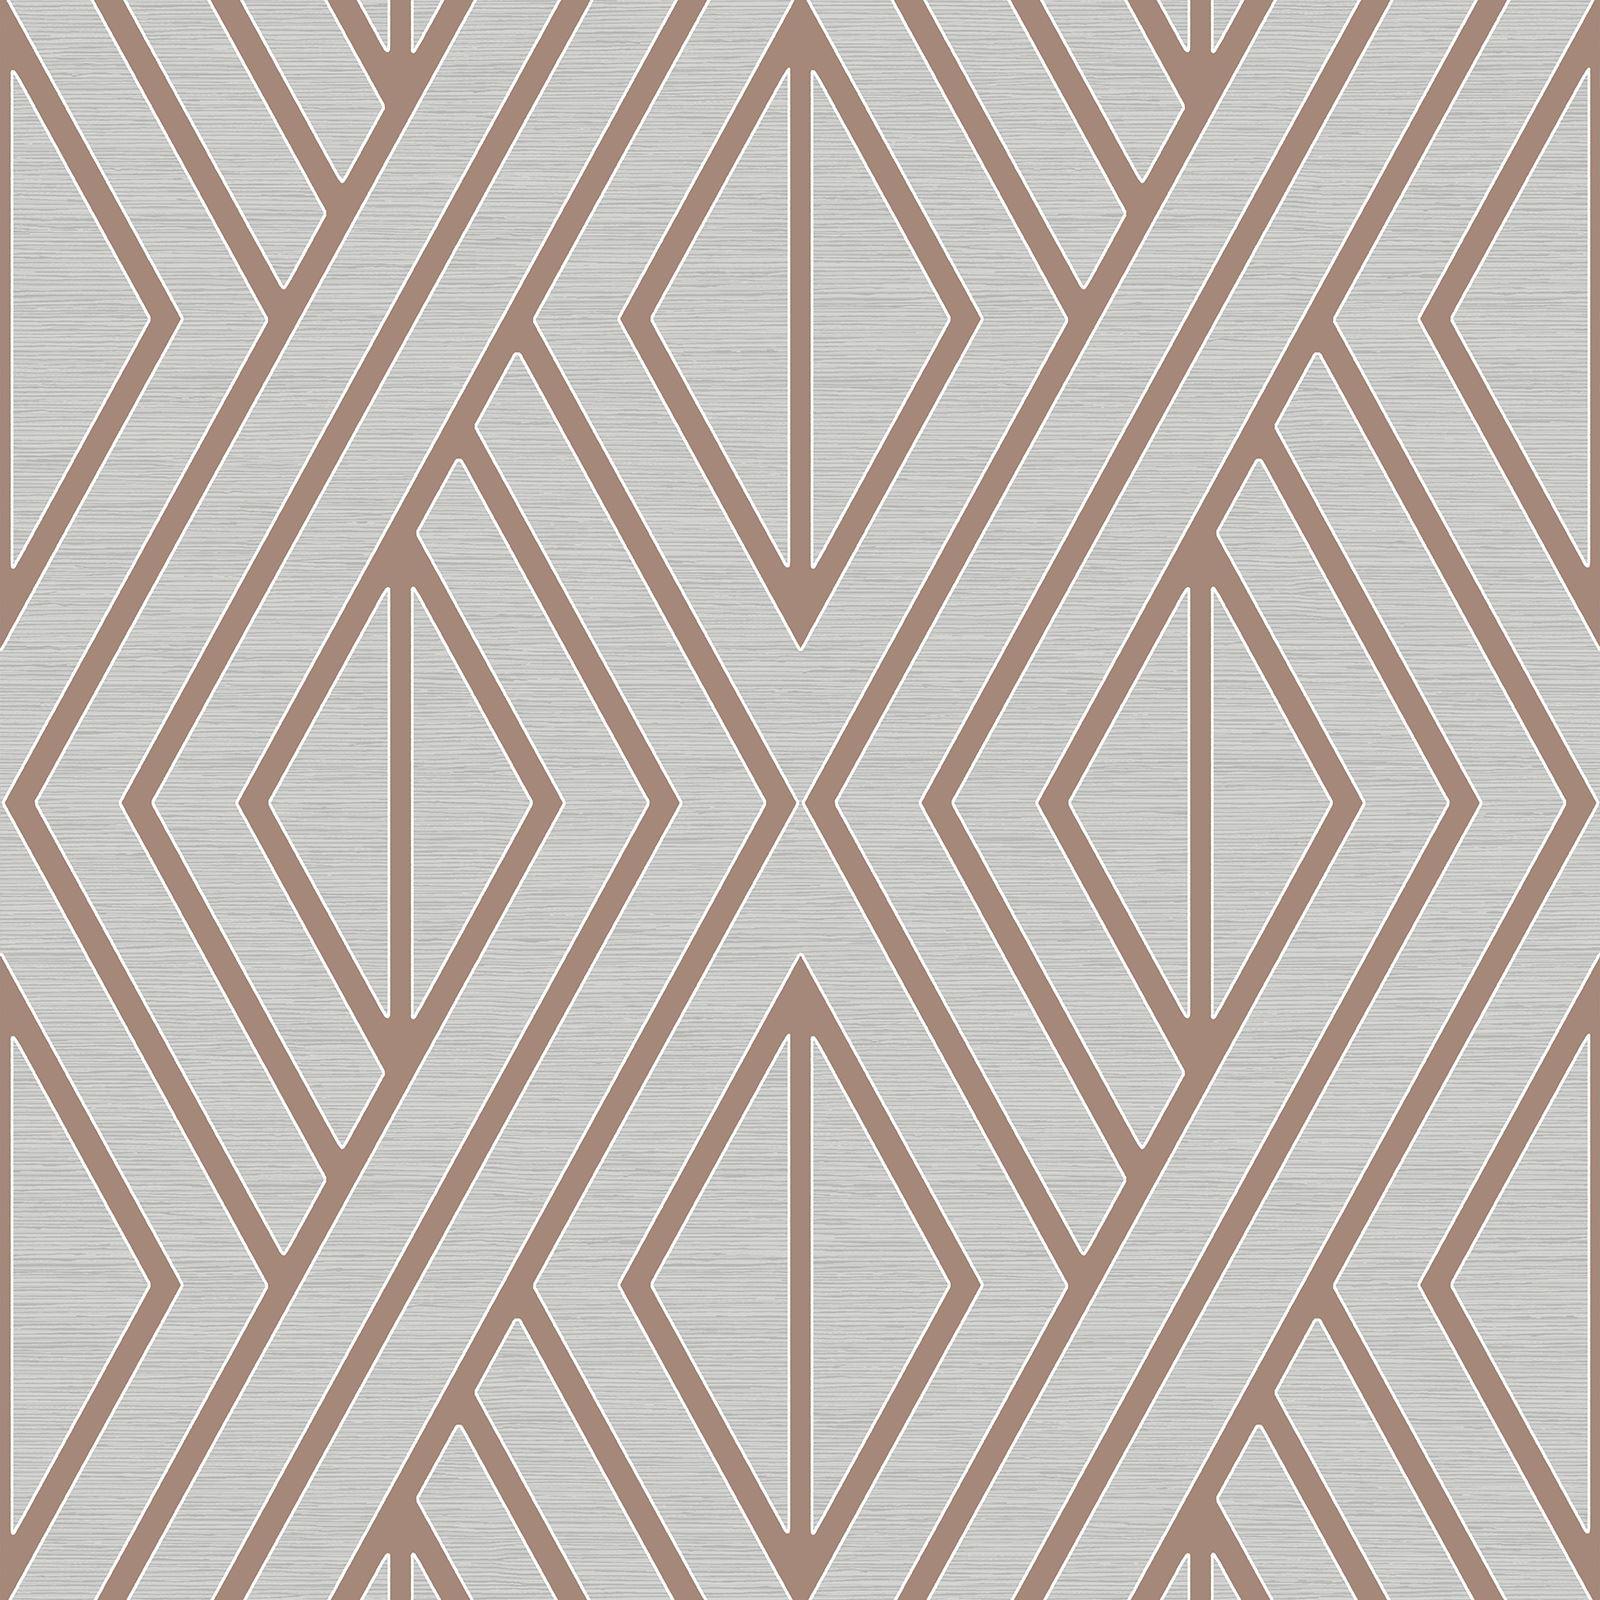 miniatura 56 - Carta da Parati Geometrica Arredamento Camera Moderno Vari Disegni e Colori